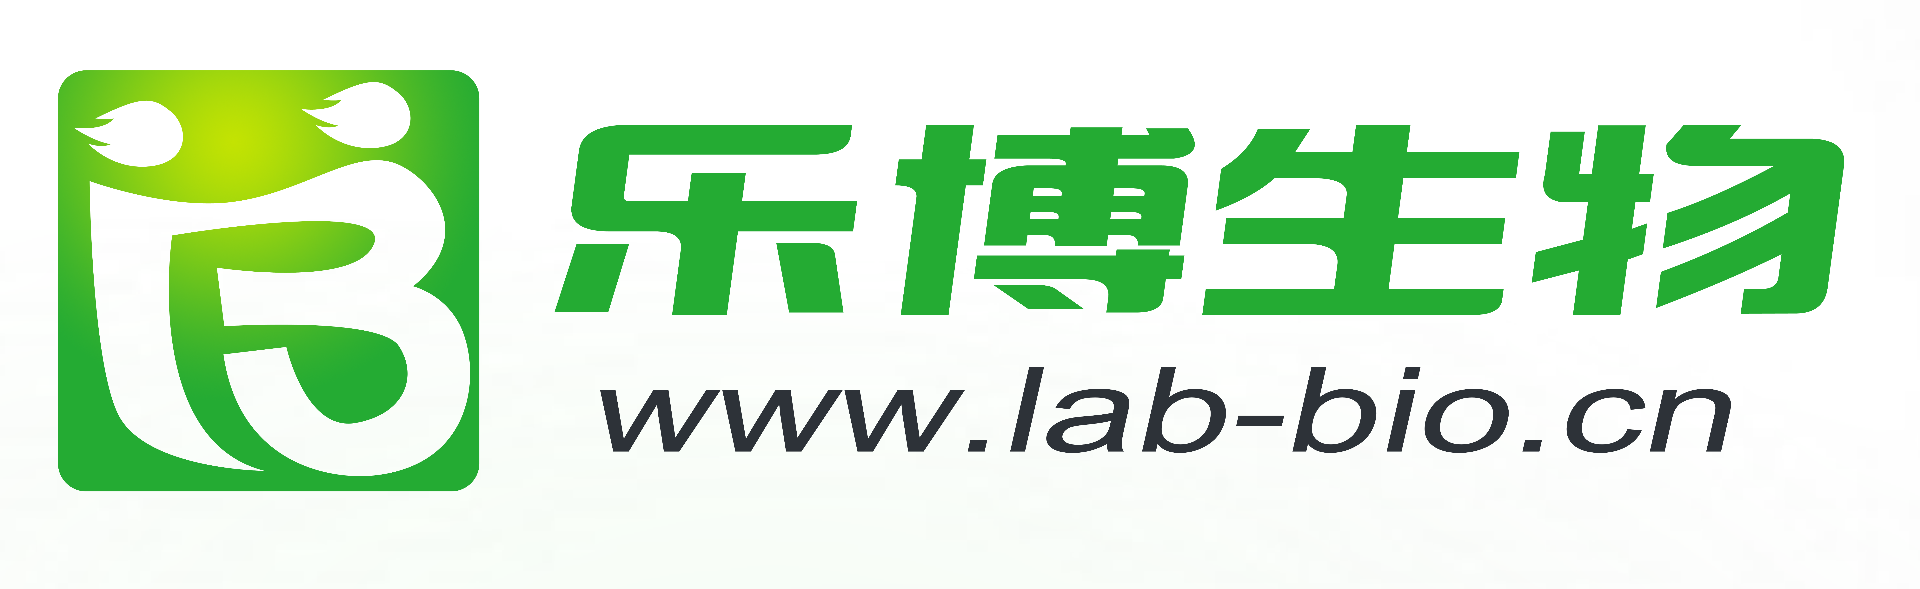 Beijing LeBo Biotech Company